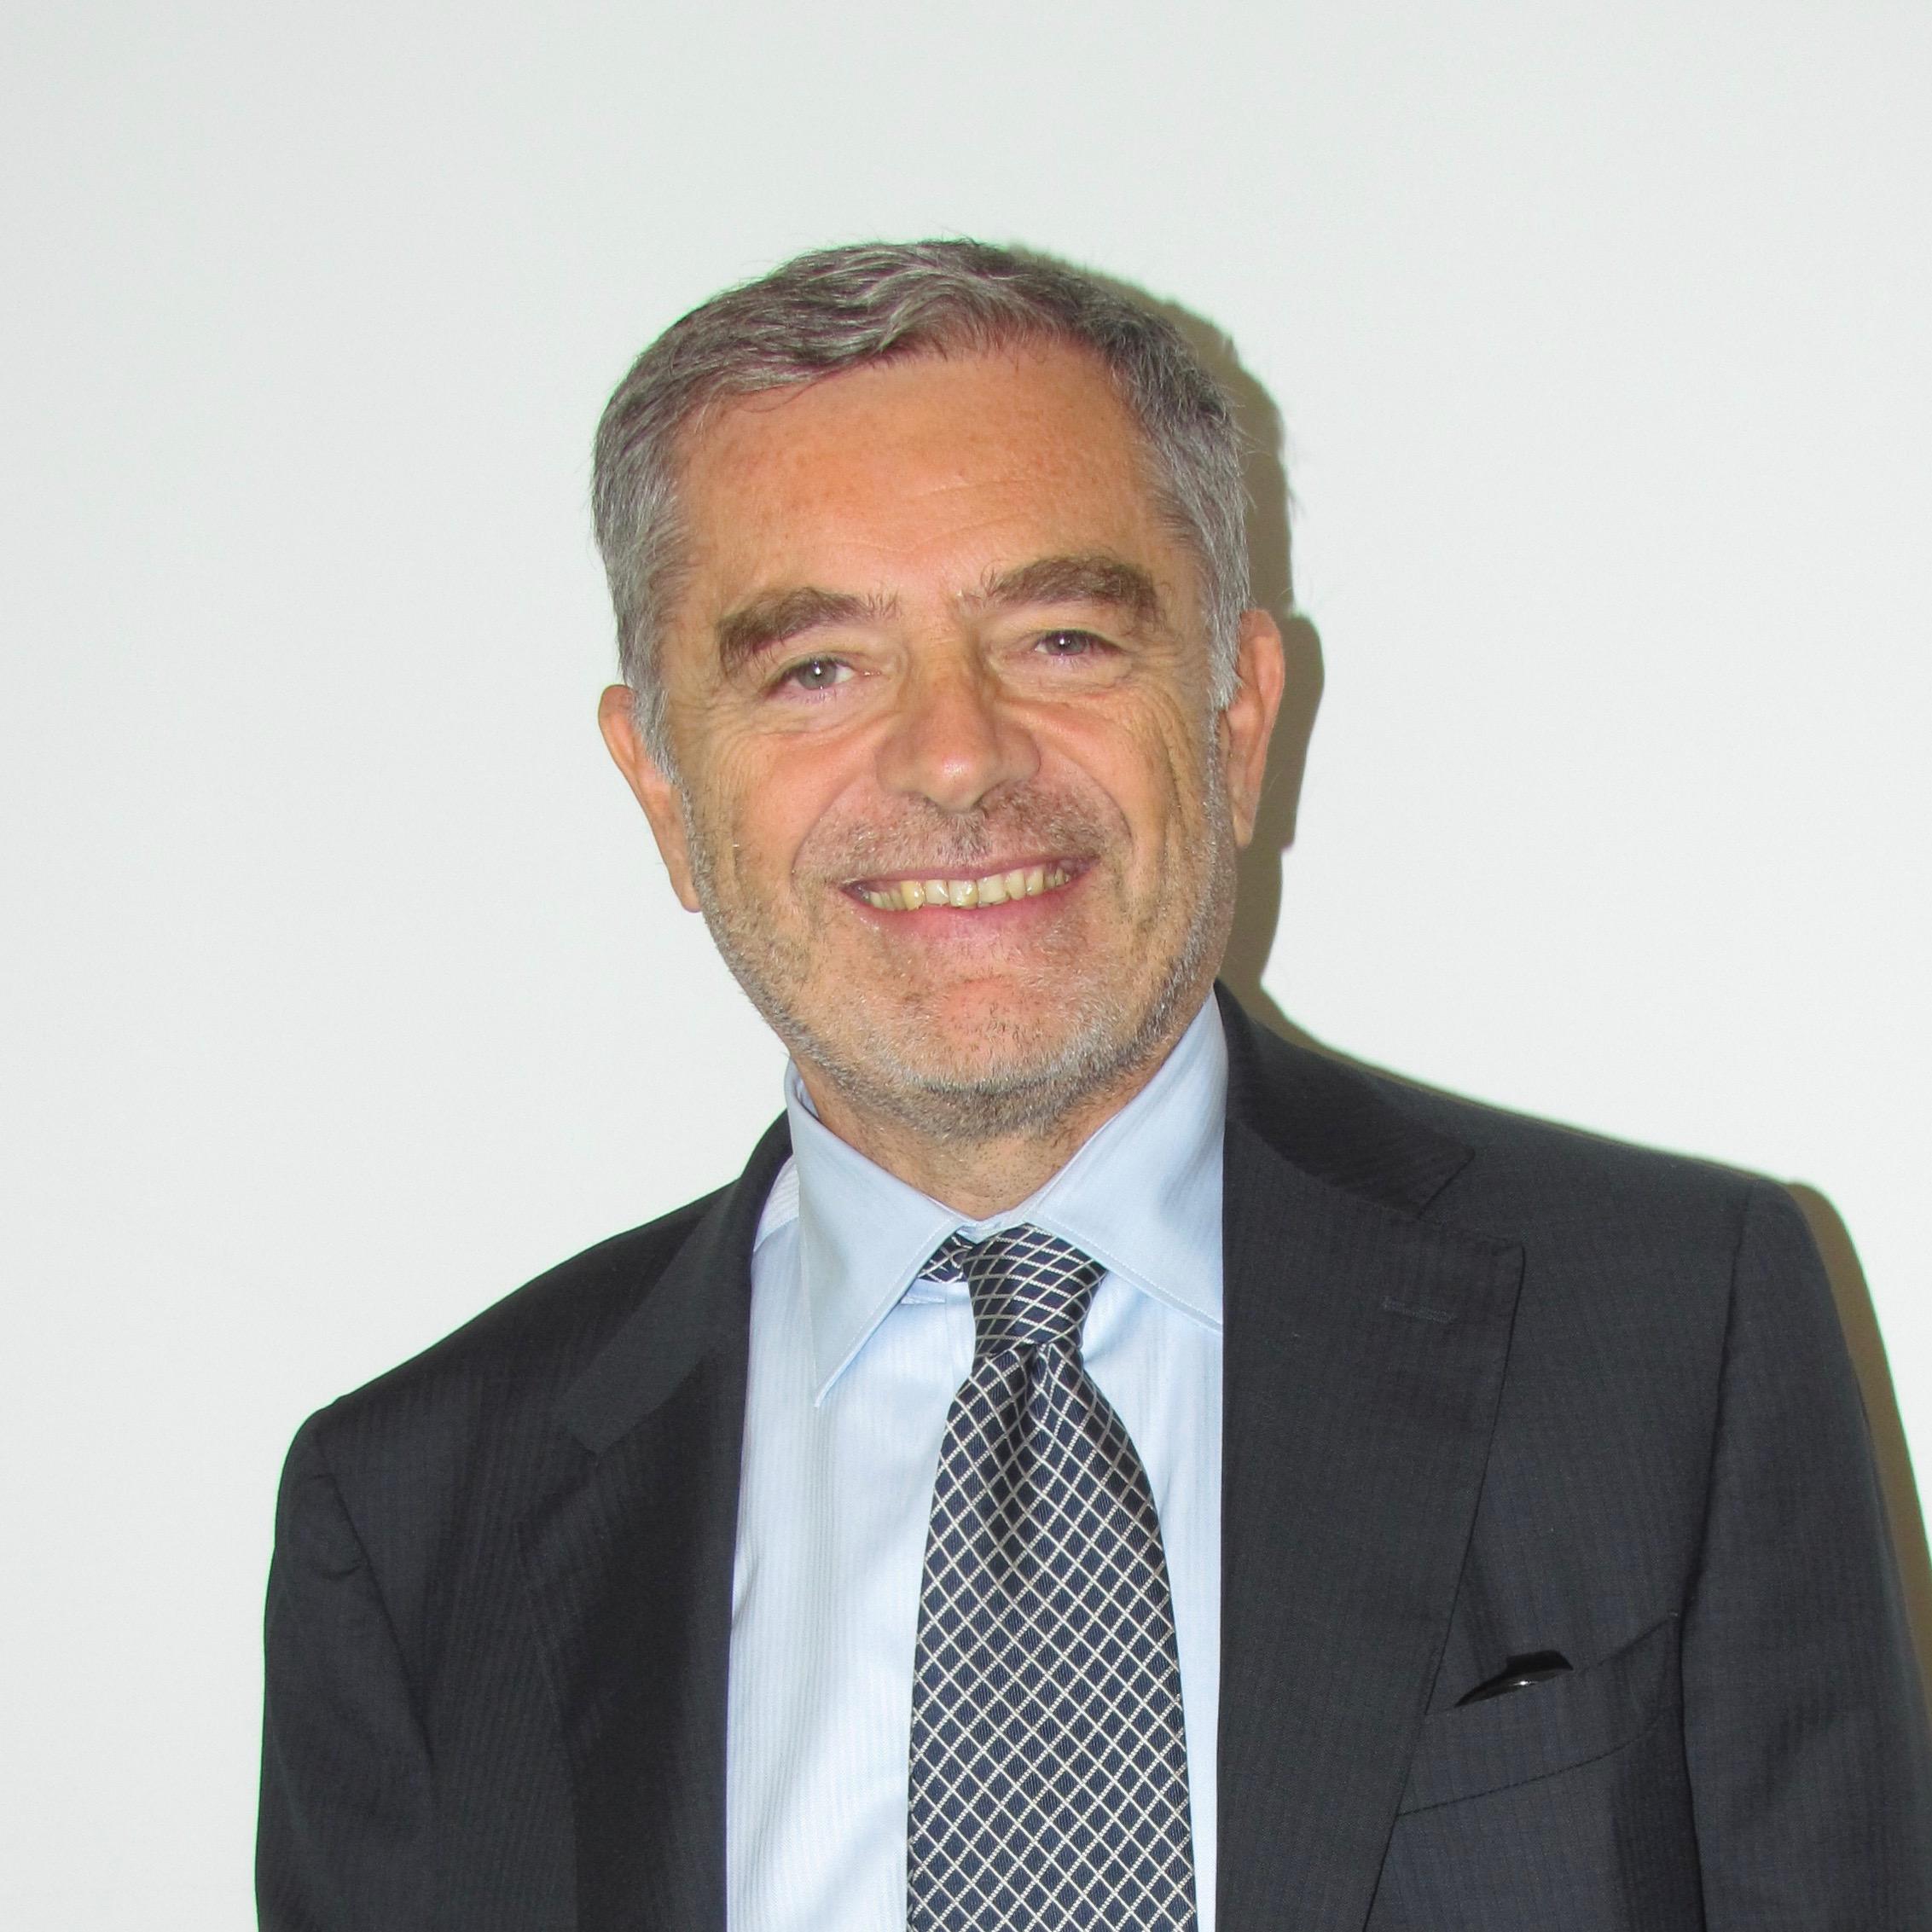 Claudio Sella